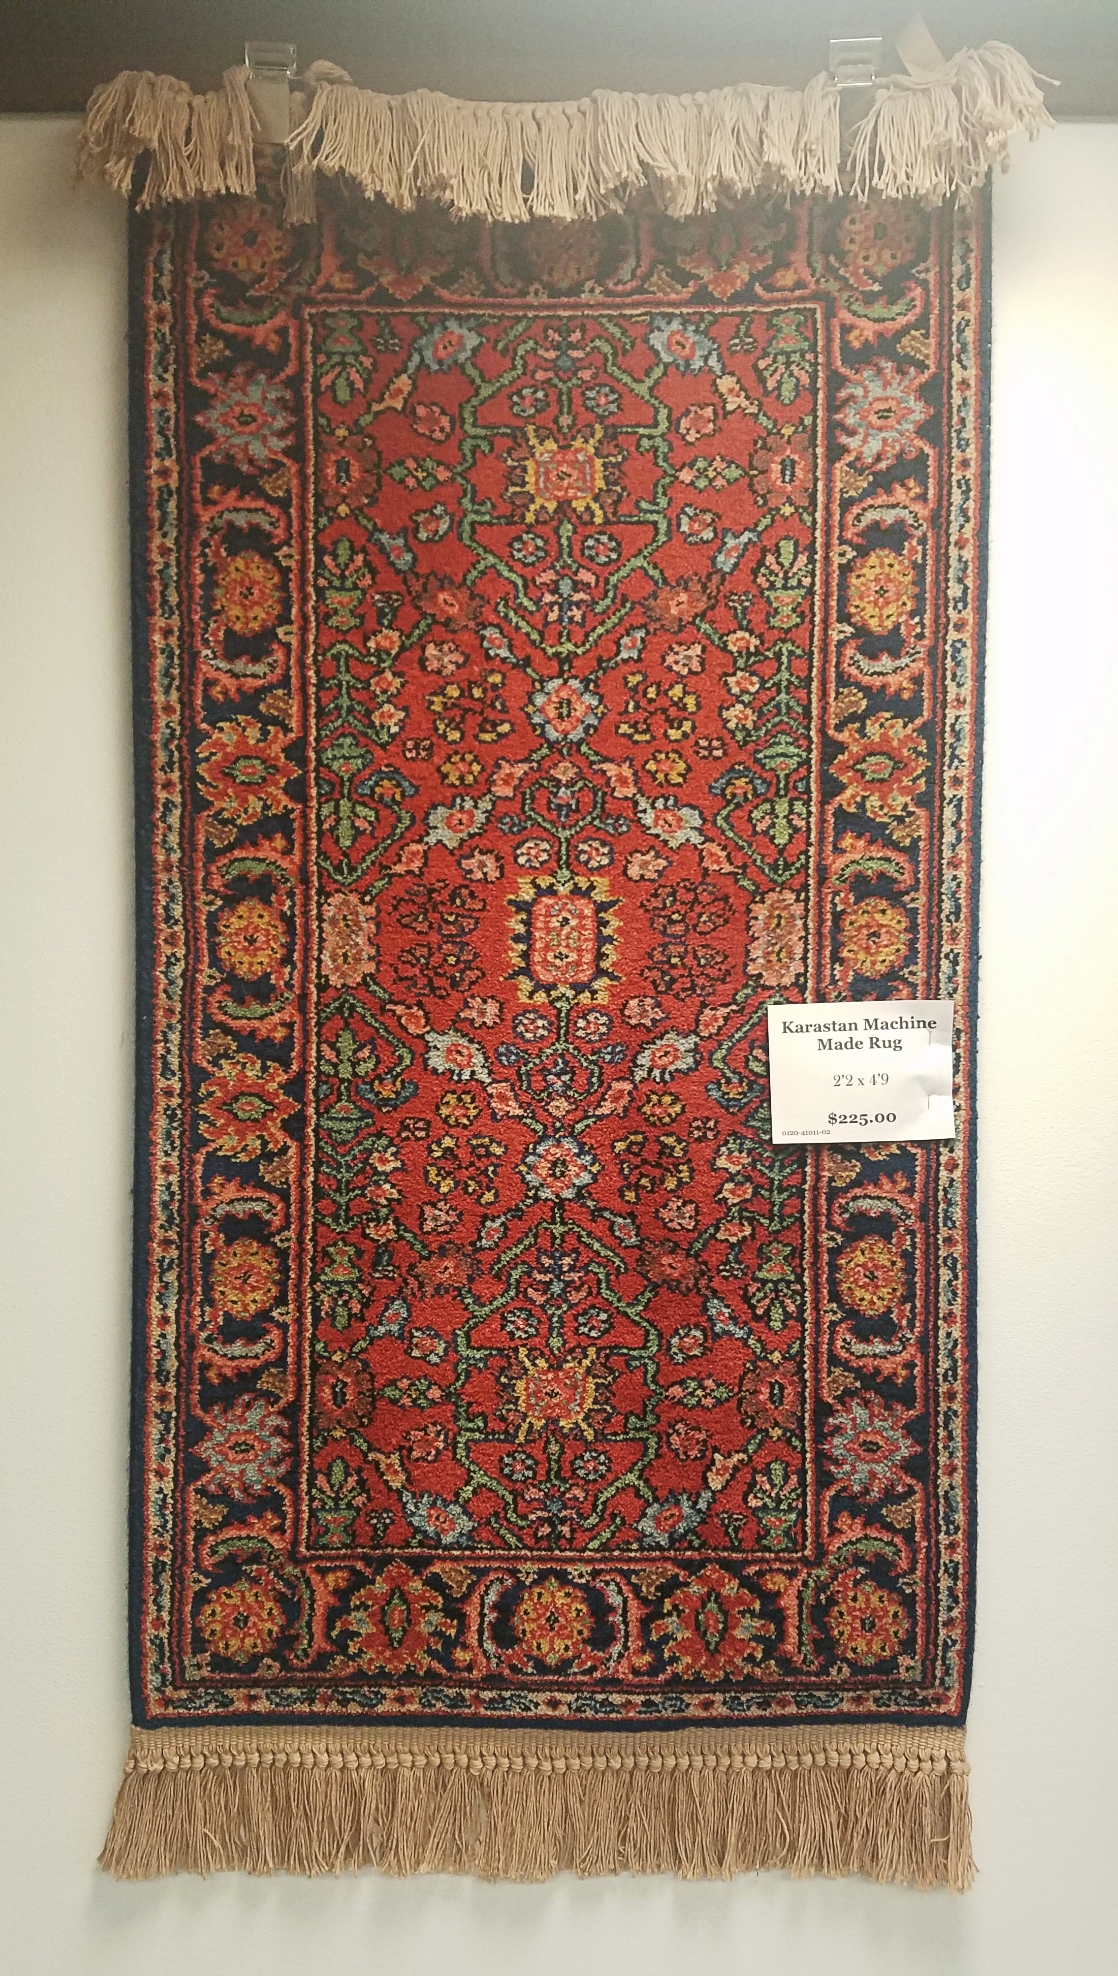 Wool Karastan Machine Made Rug for Sale